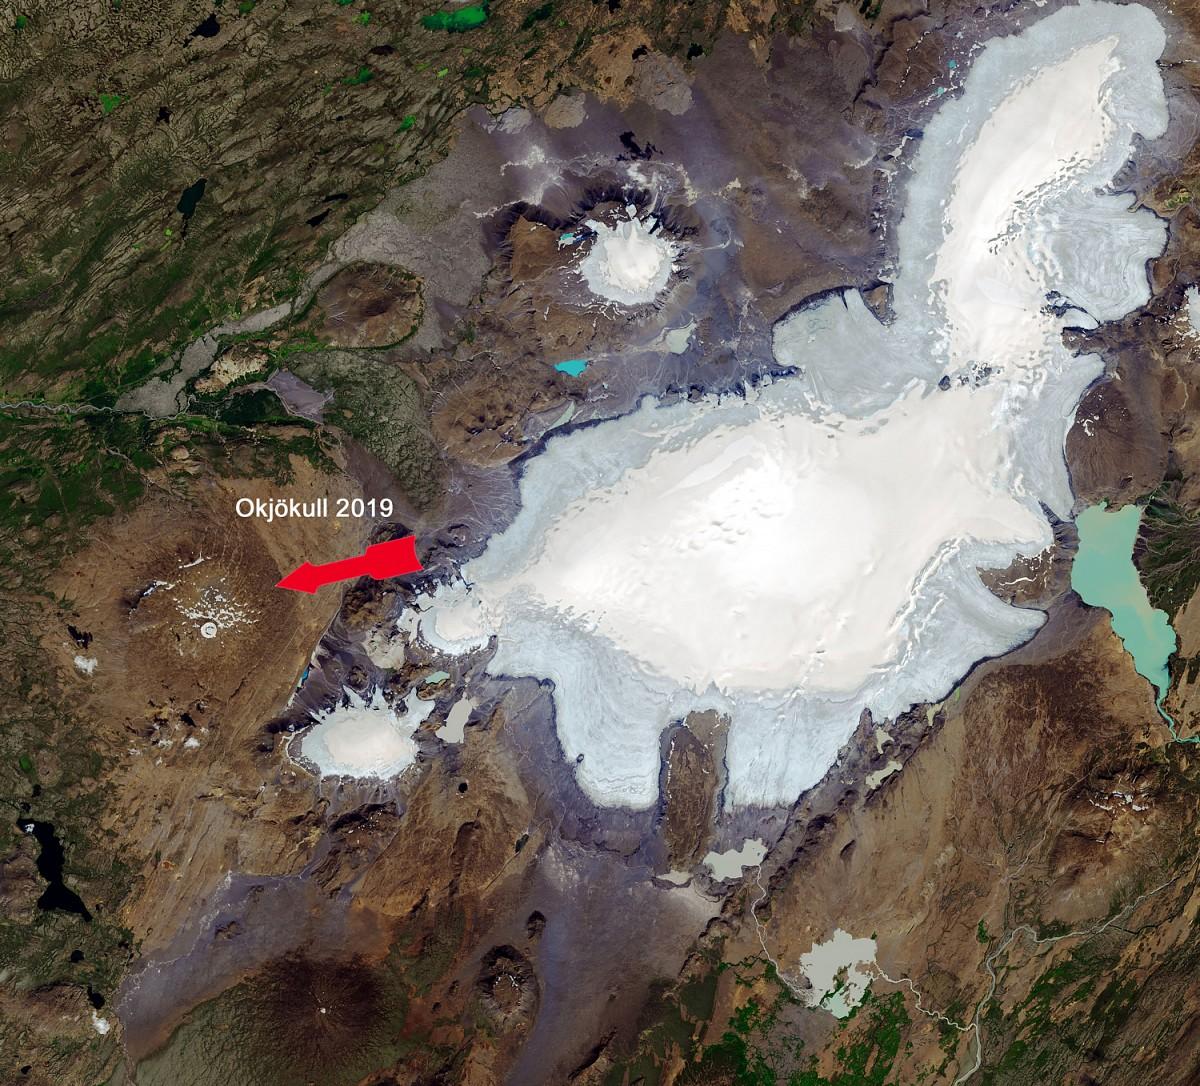 Die Eisreste des Okjökull auf Island am 1. August 2019 © NASA Earth Observatory, Joshua Stevens